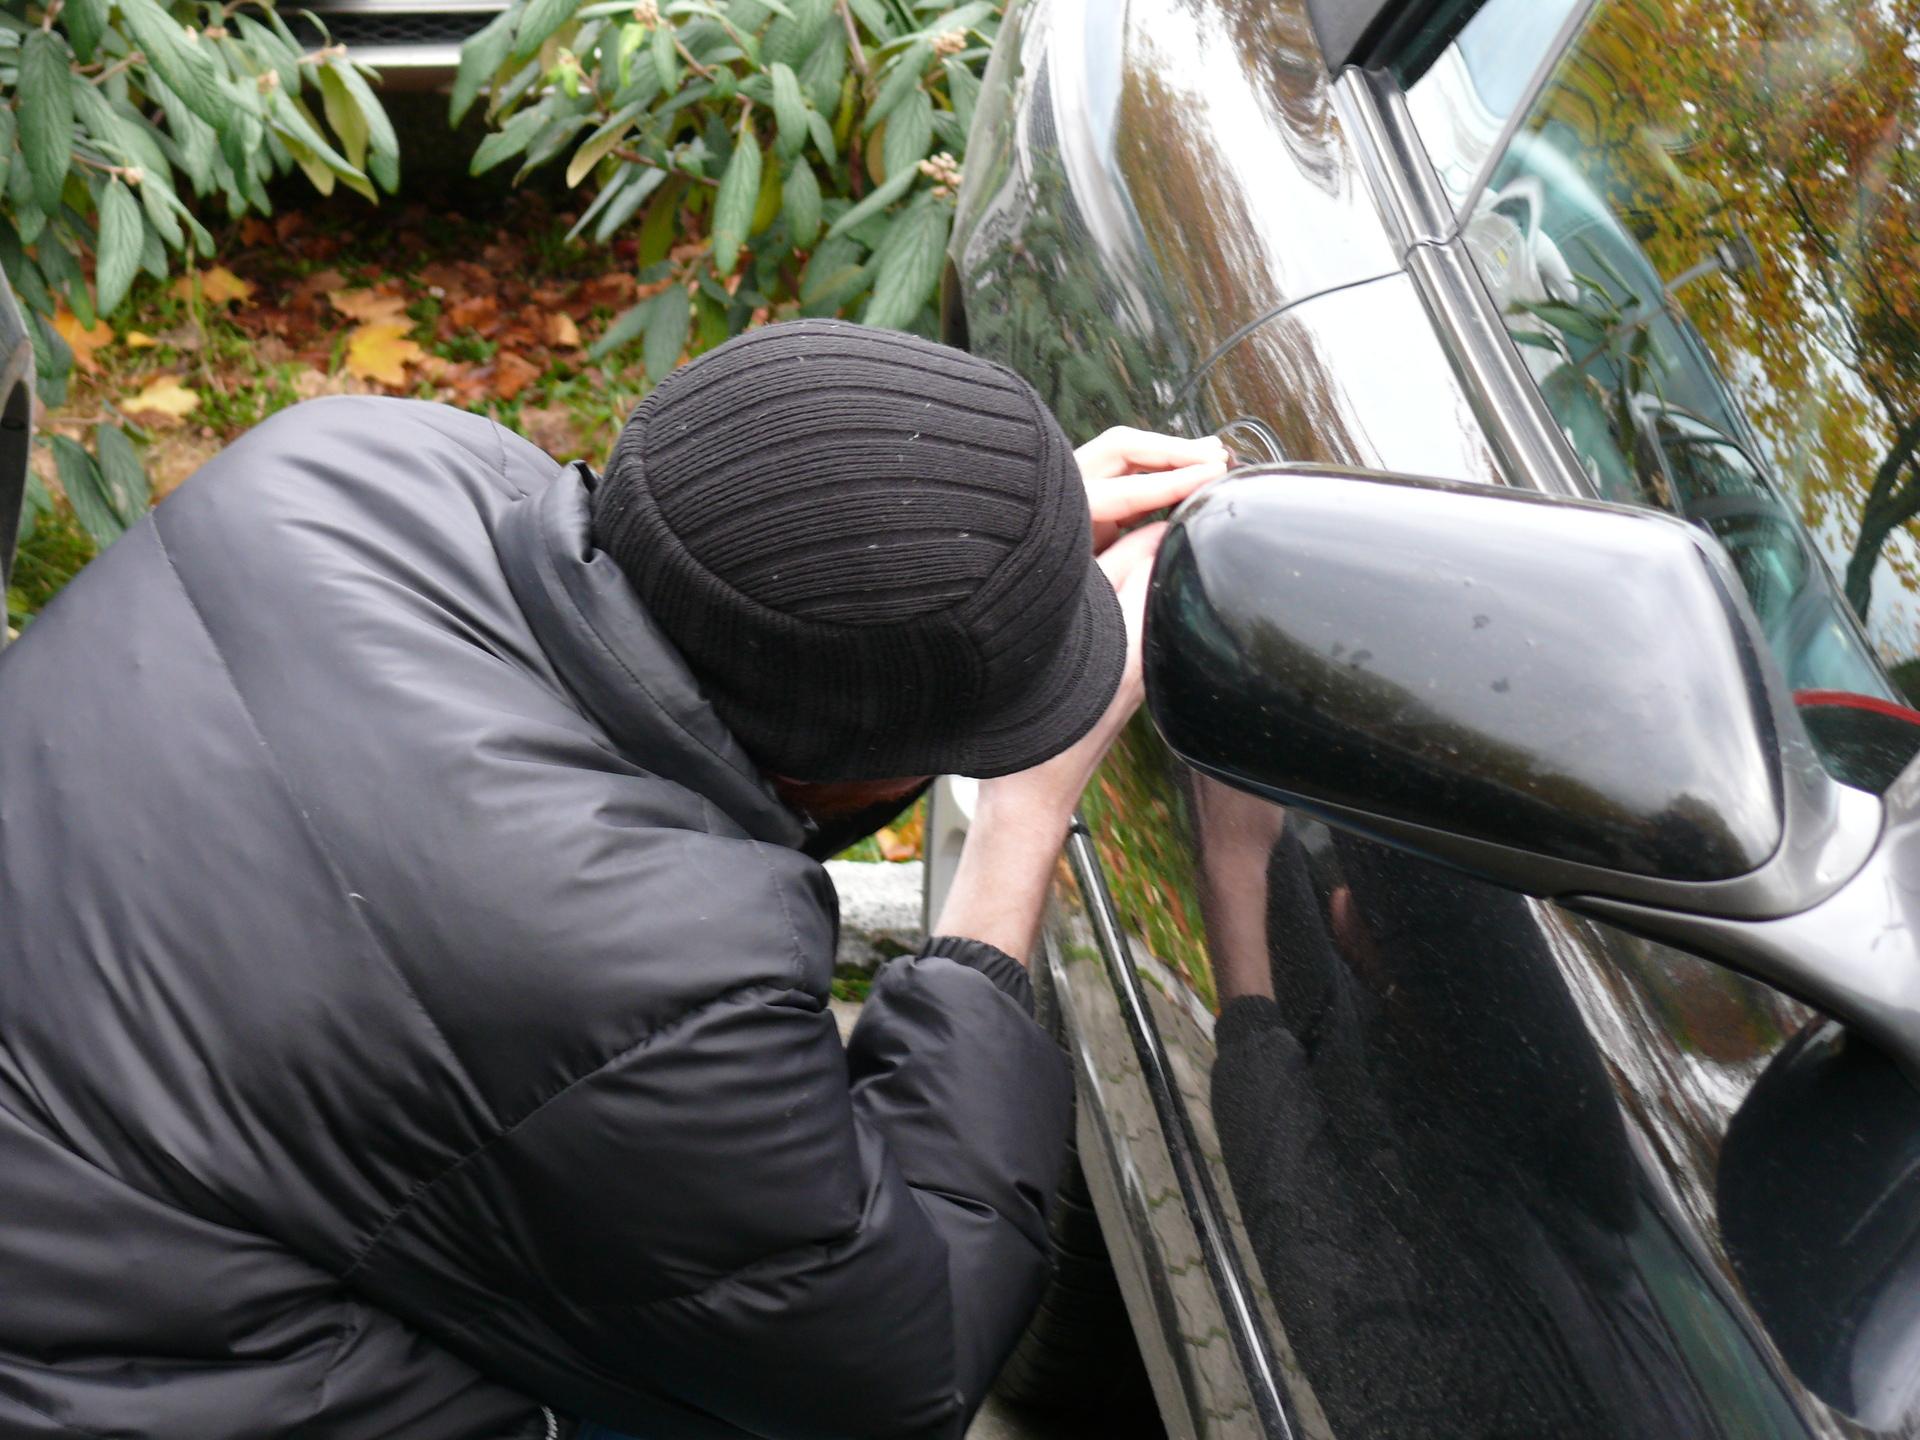 car-theft-1572653-1920x1440